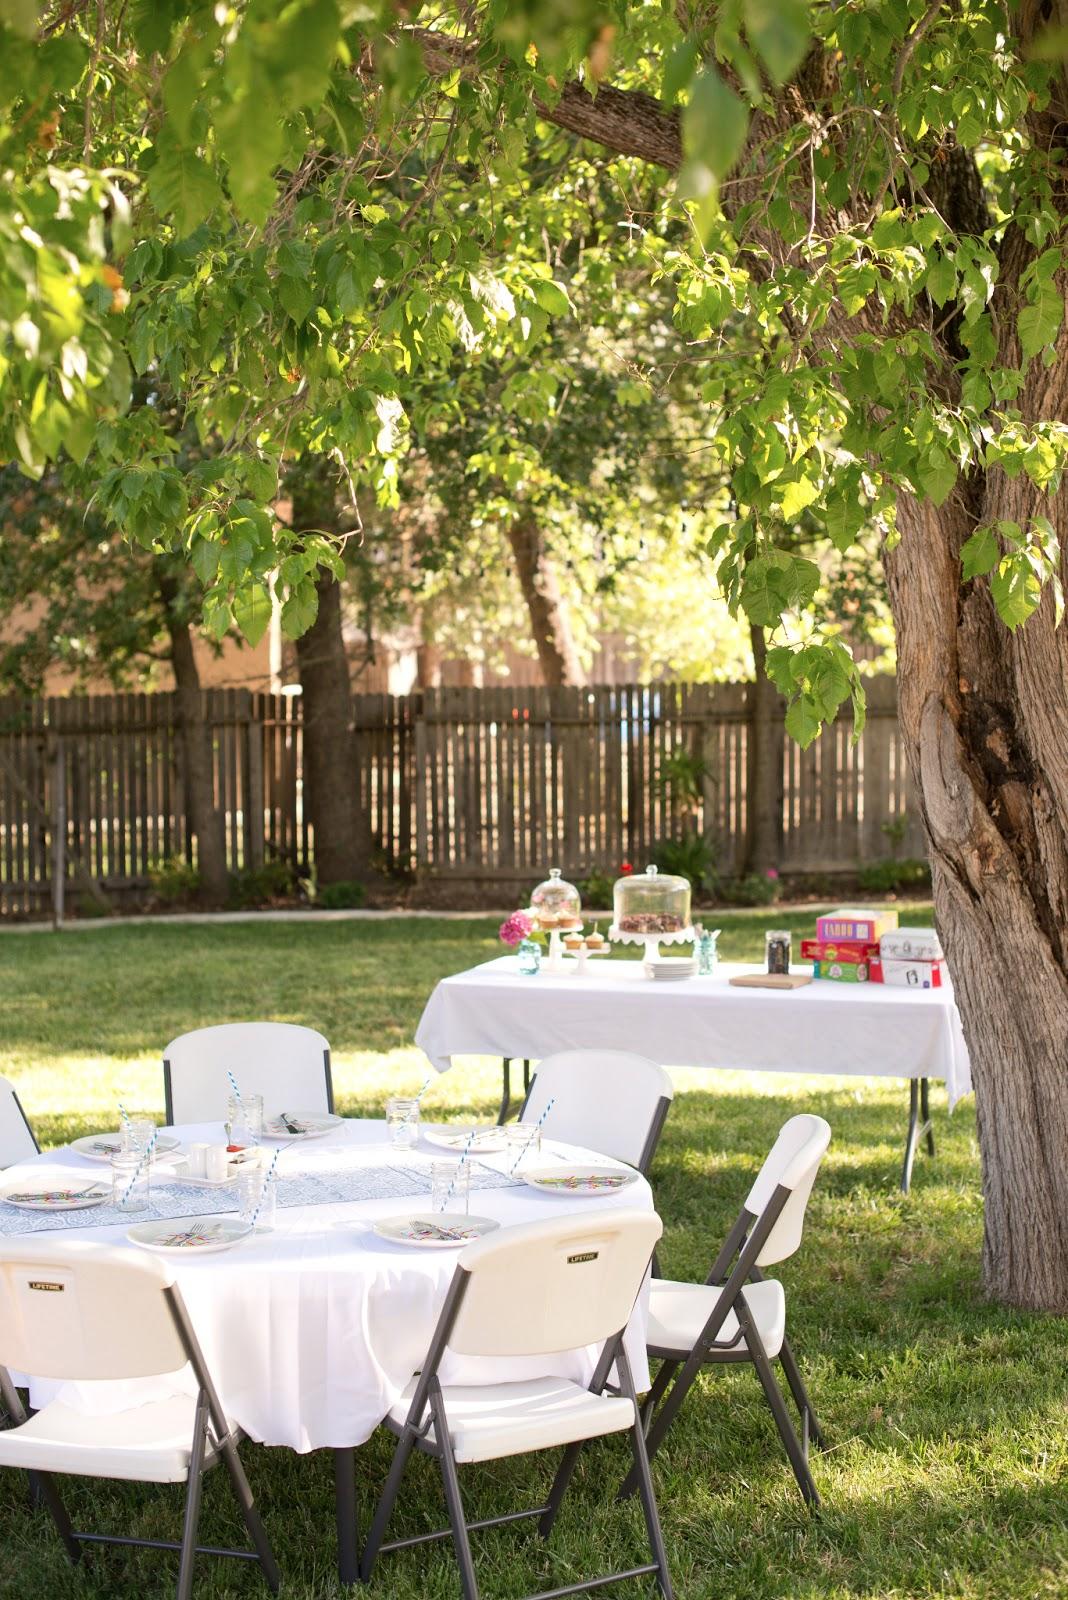 More Backyard Dining + Avocado Ranch Burgers Recipe